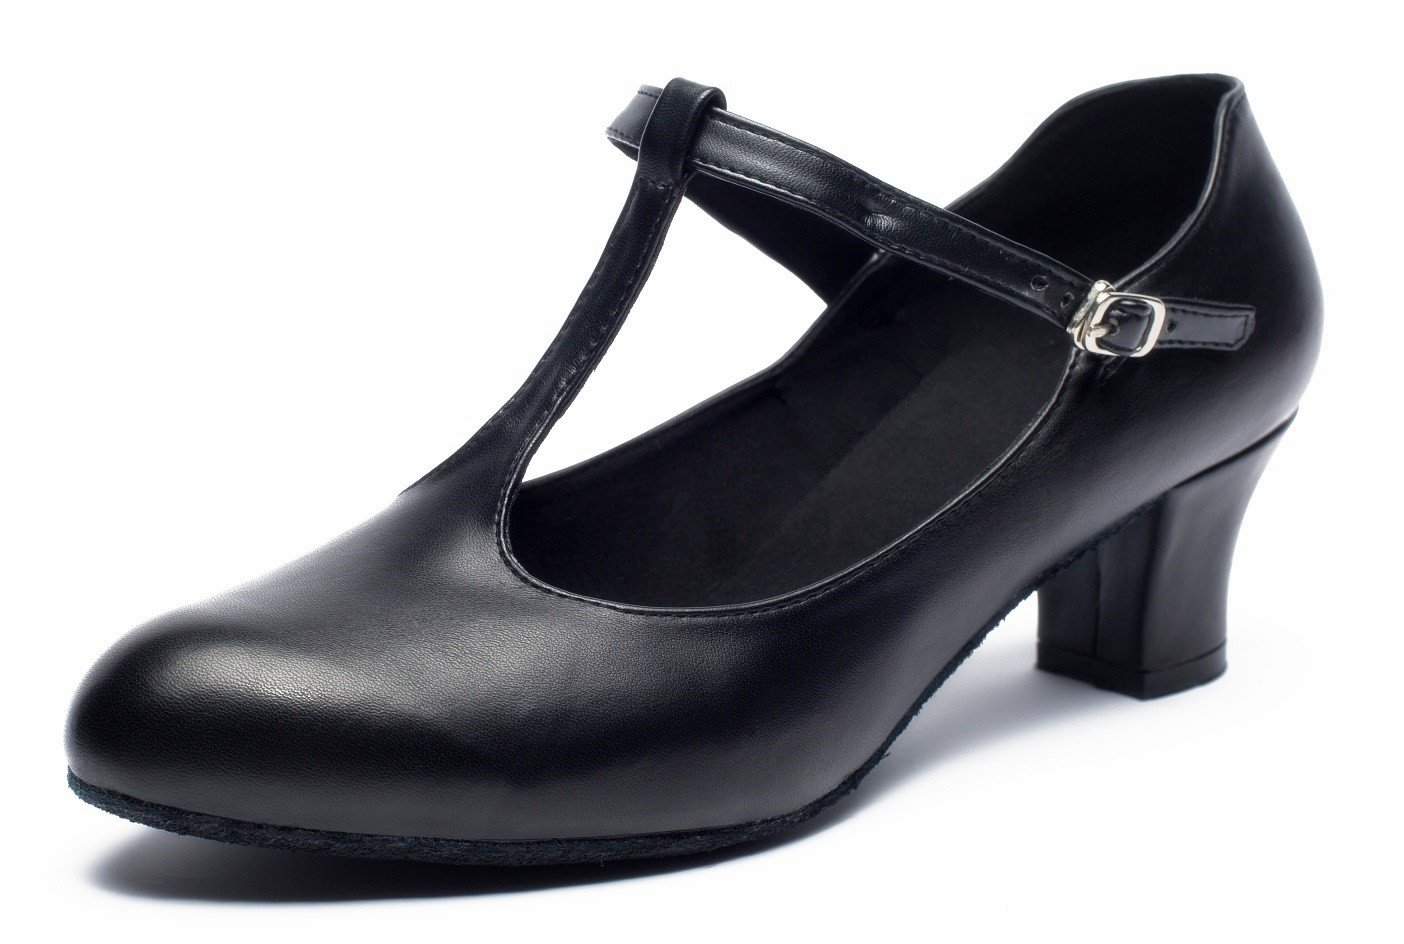 Joocare Womens Professional Latin Salsa Ballroom Modern Dance Shoes Ladies Party Wedding Shoes (6-6.5US/37, Black)